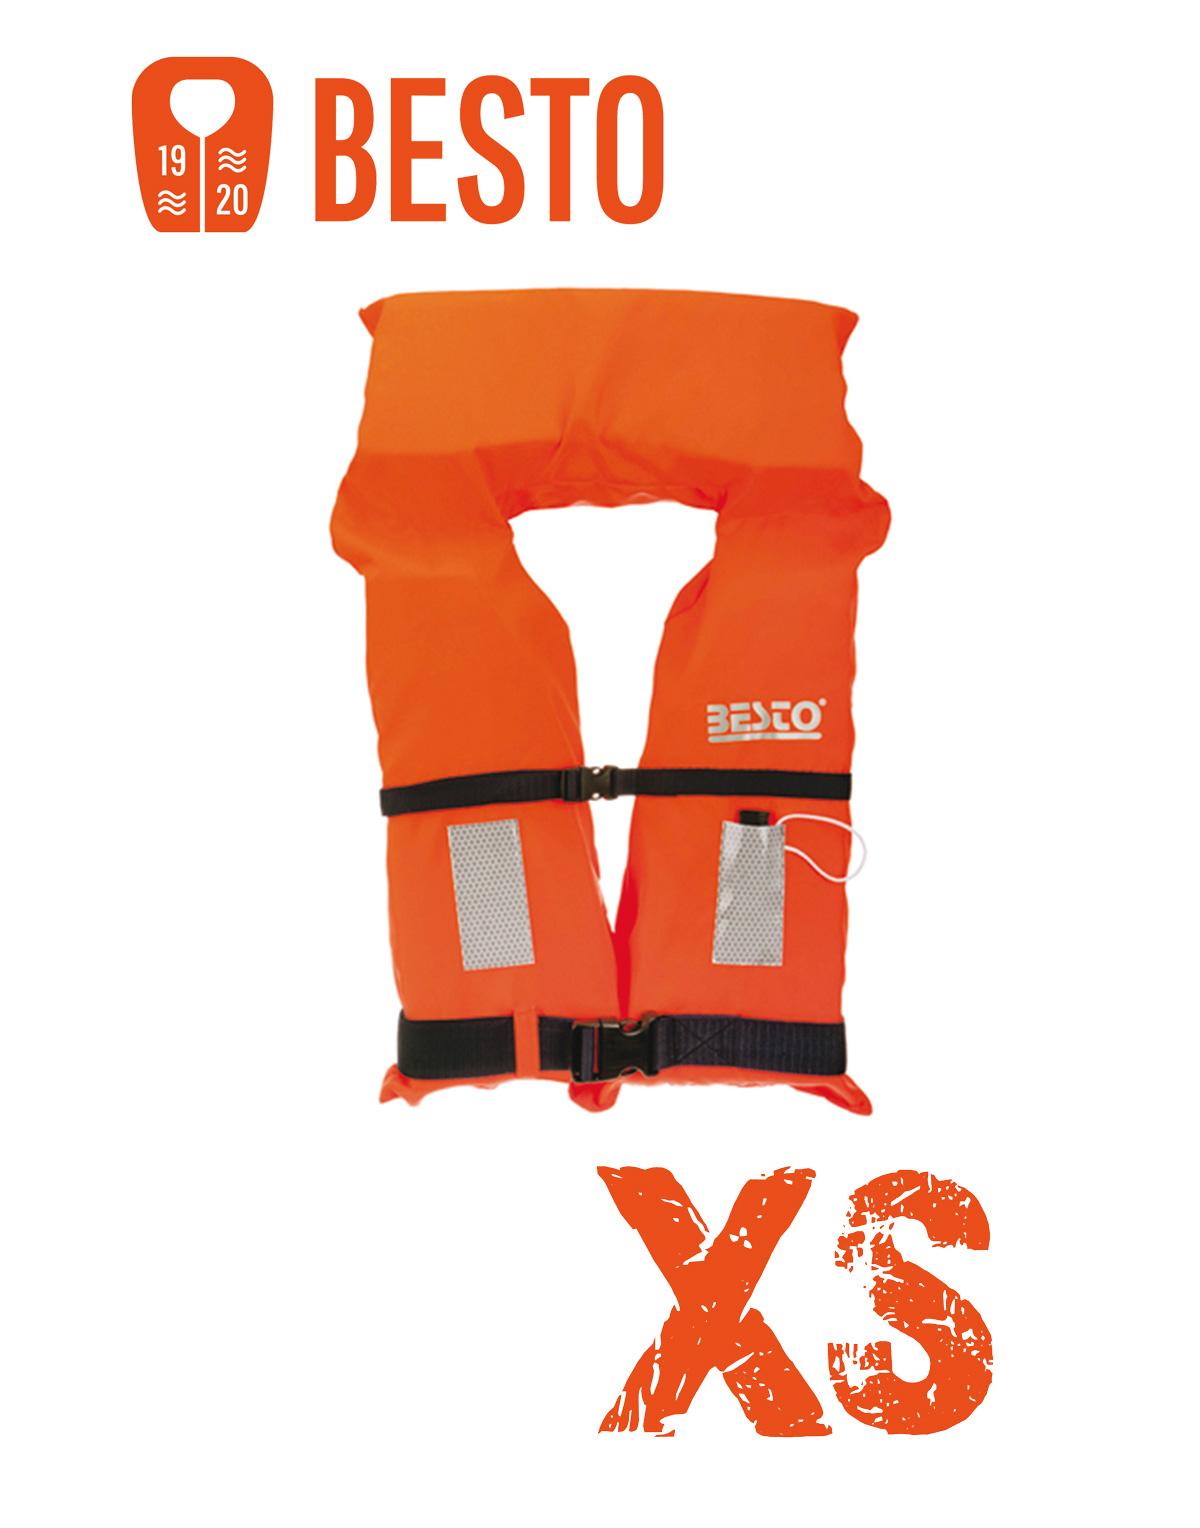 Besto Rettungsweste Orange 100N in Größe: XS